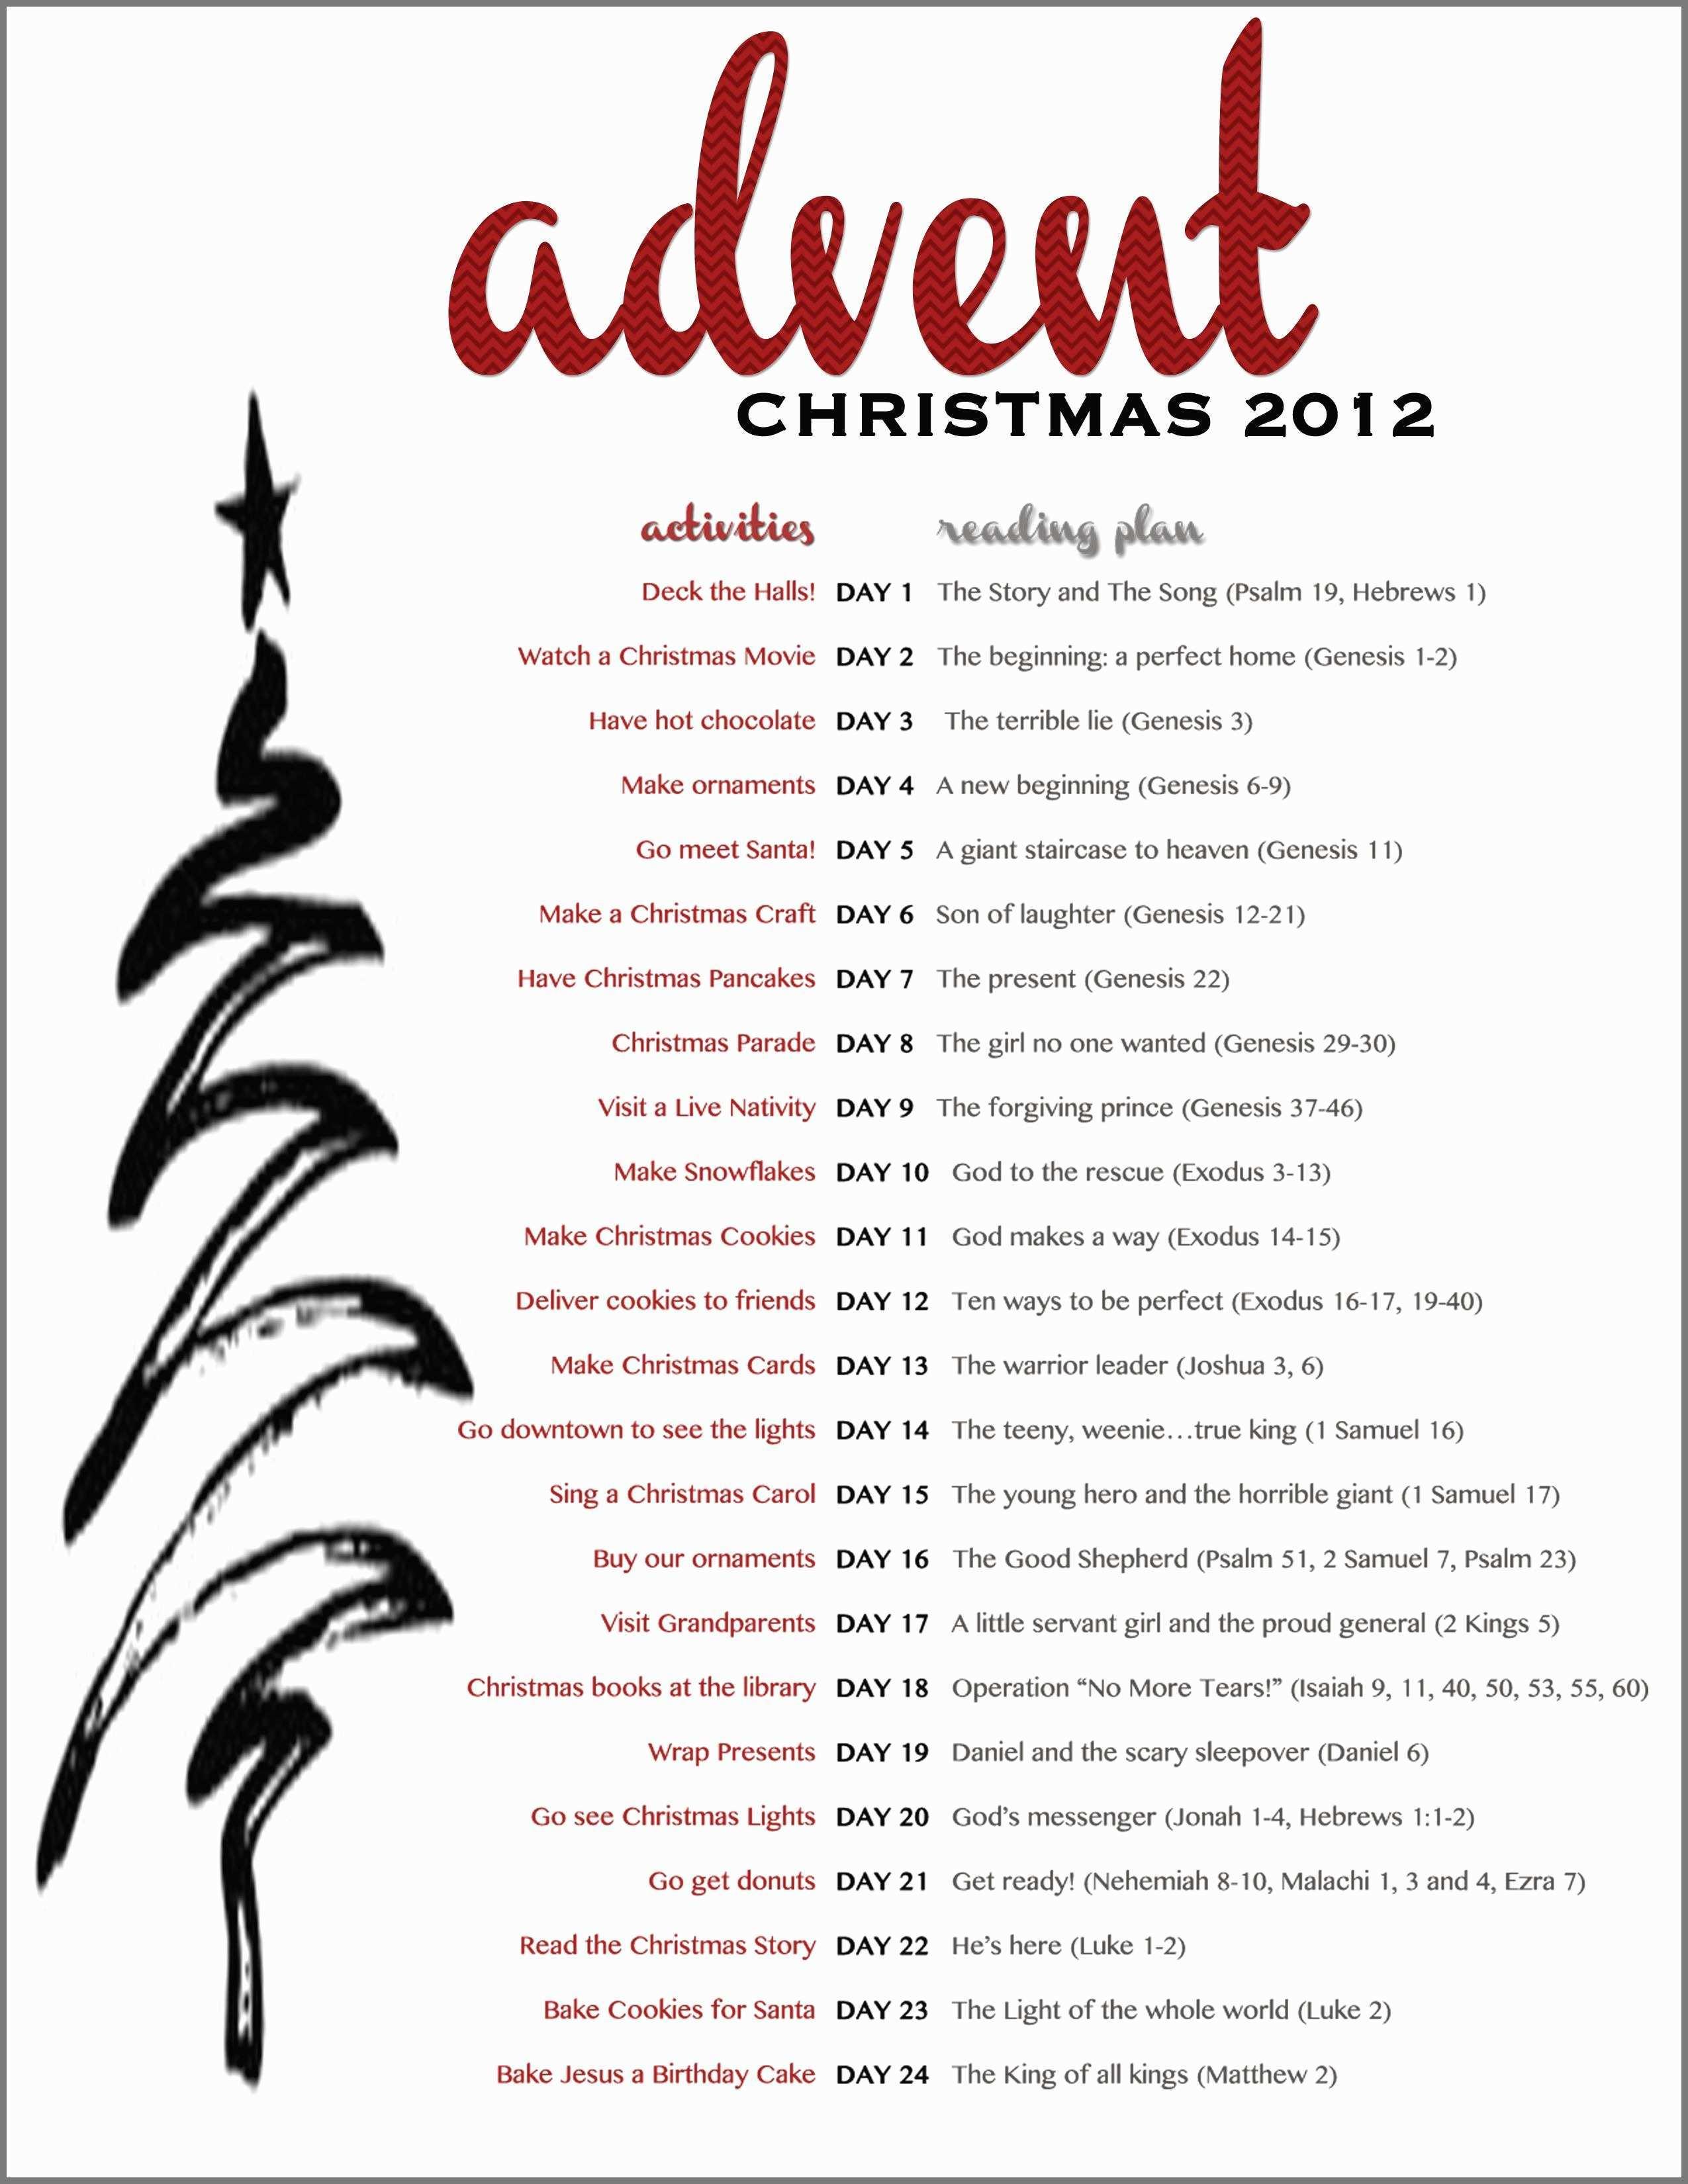 Short Christmas Plays - Gallery 4K Wallpapers - Free Printable Christmas Plays Church